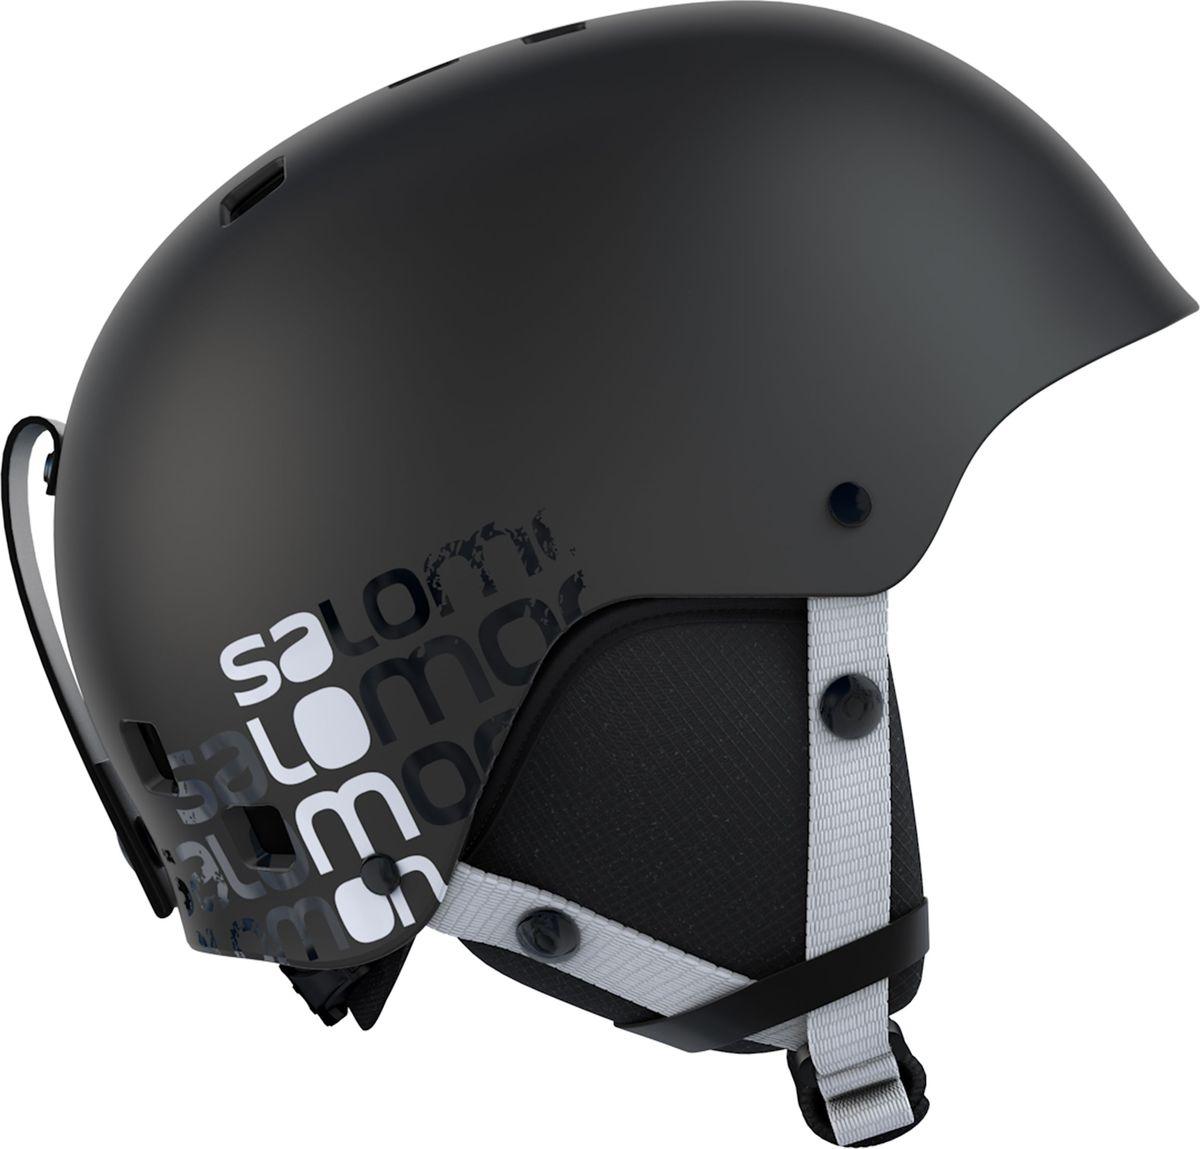 Шлем зимний Salomon Ghost Black. Размер L (58/62) шлем боксерский clinch olimp цвет красный размер l 58 62 см